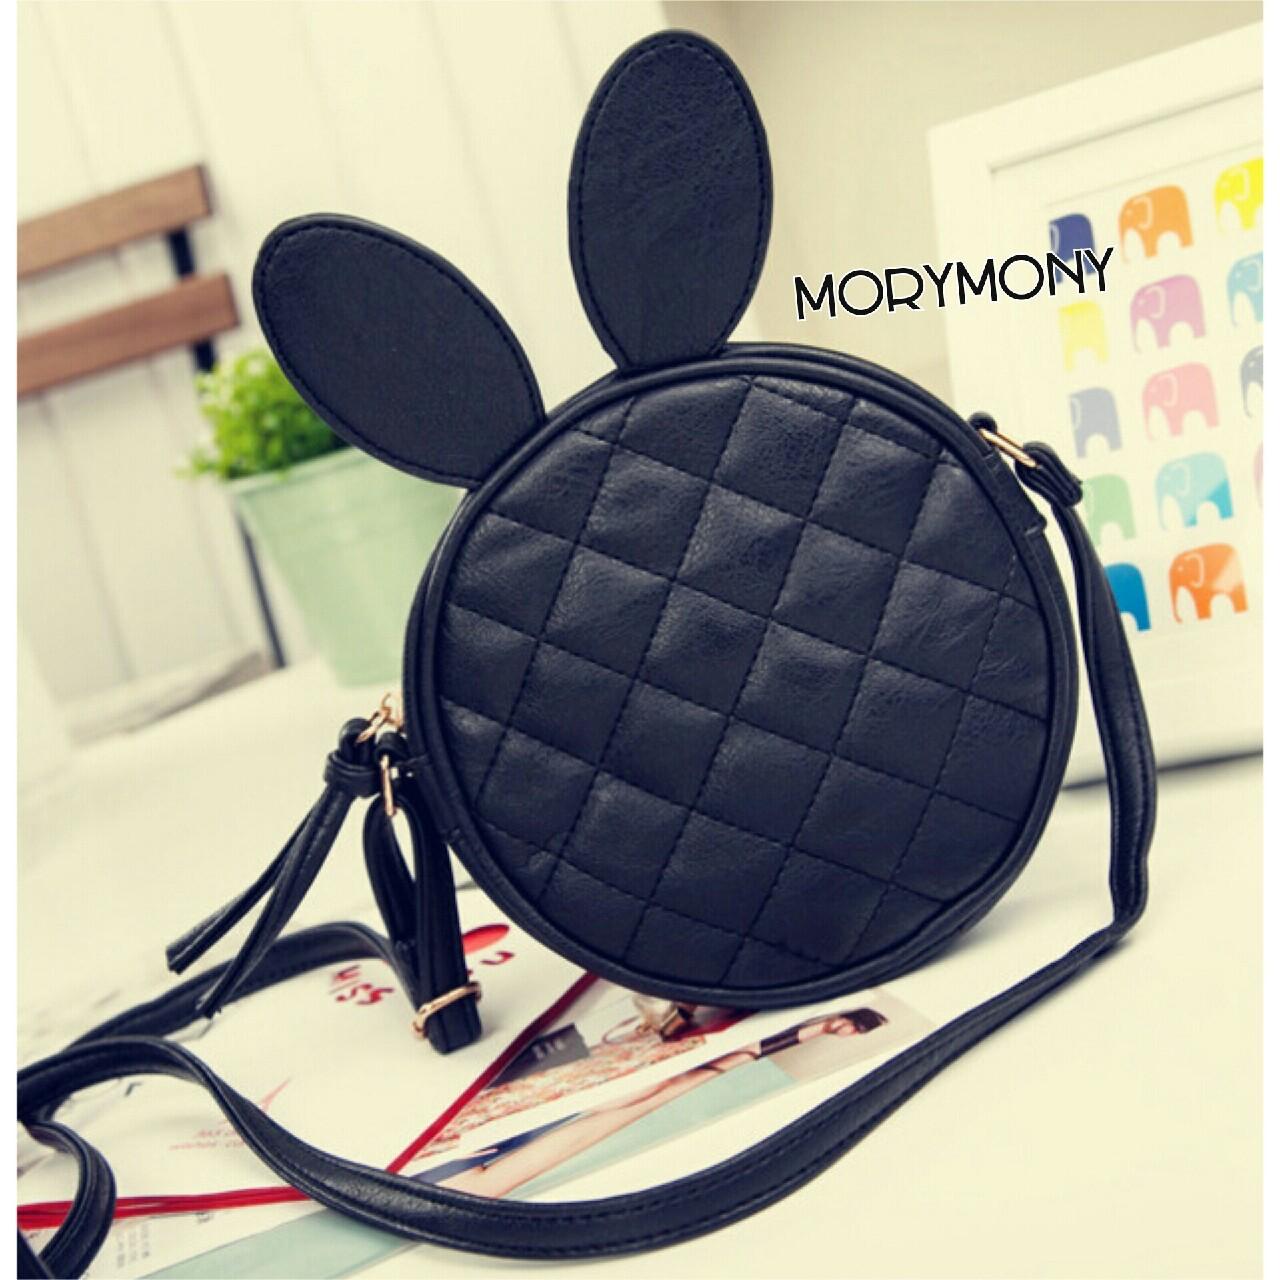 Sling bag tokopedia - Sling Bag Mouse Micky M2m Morymony